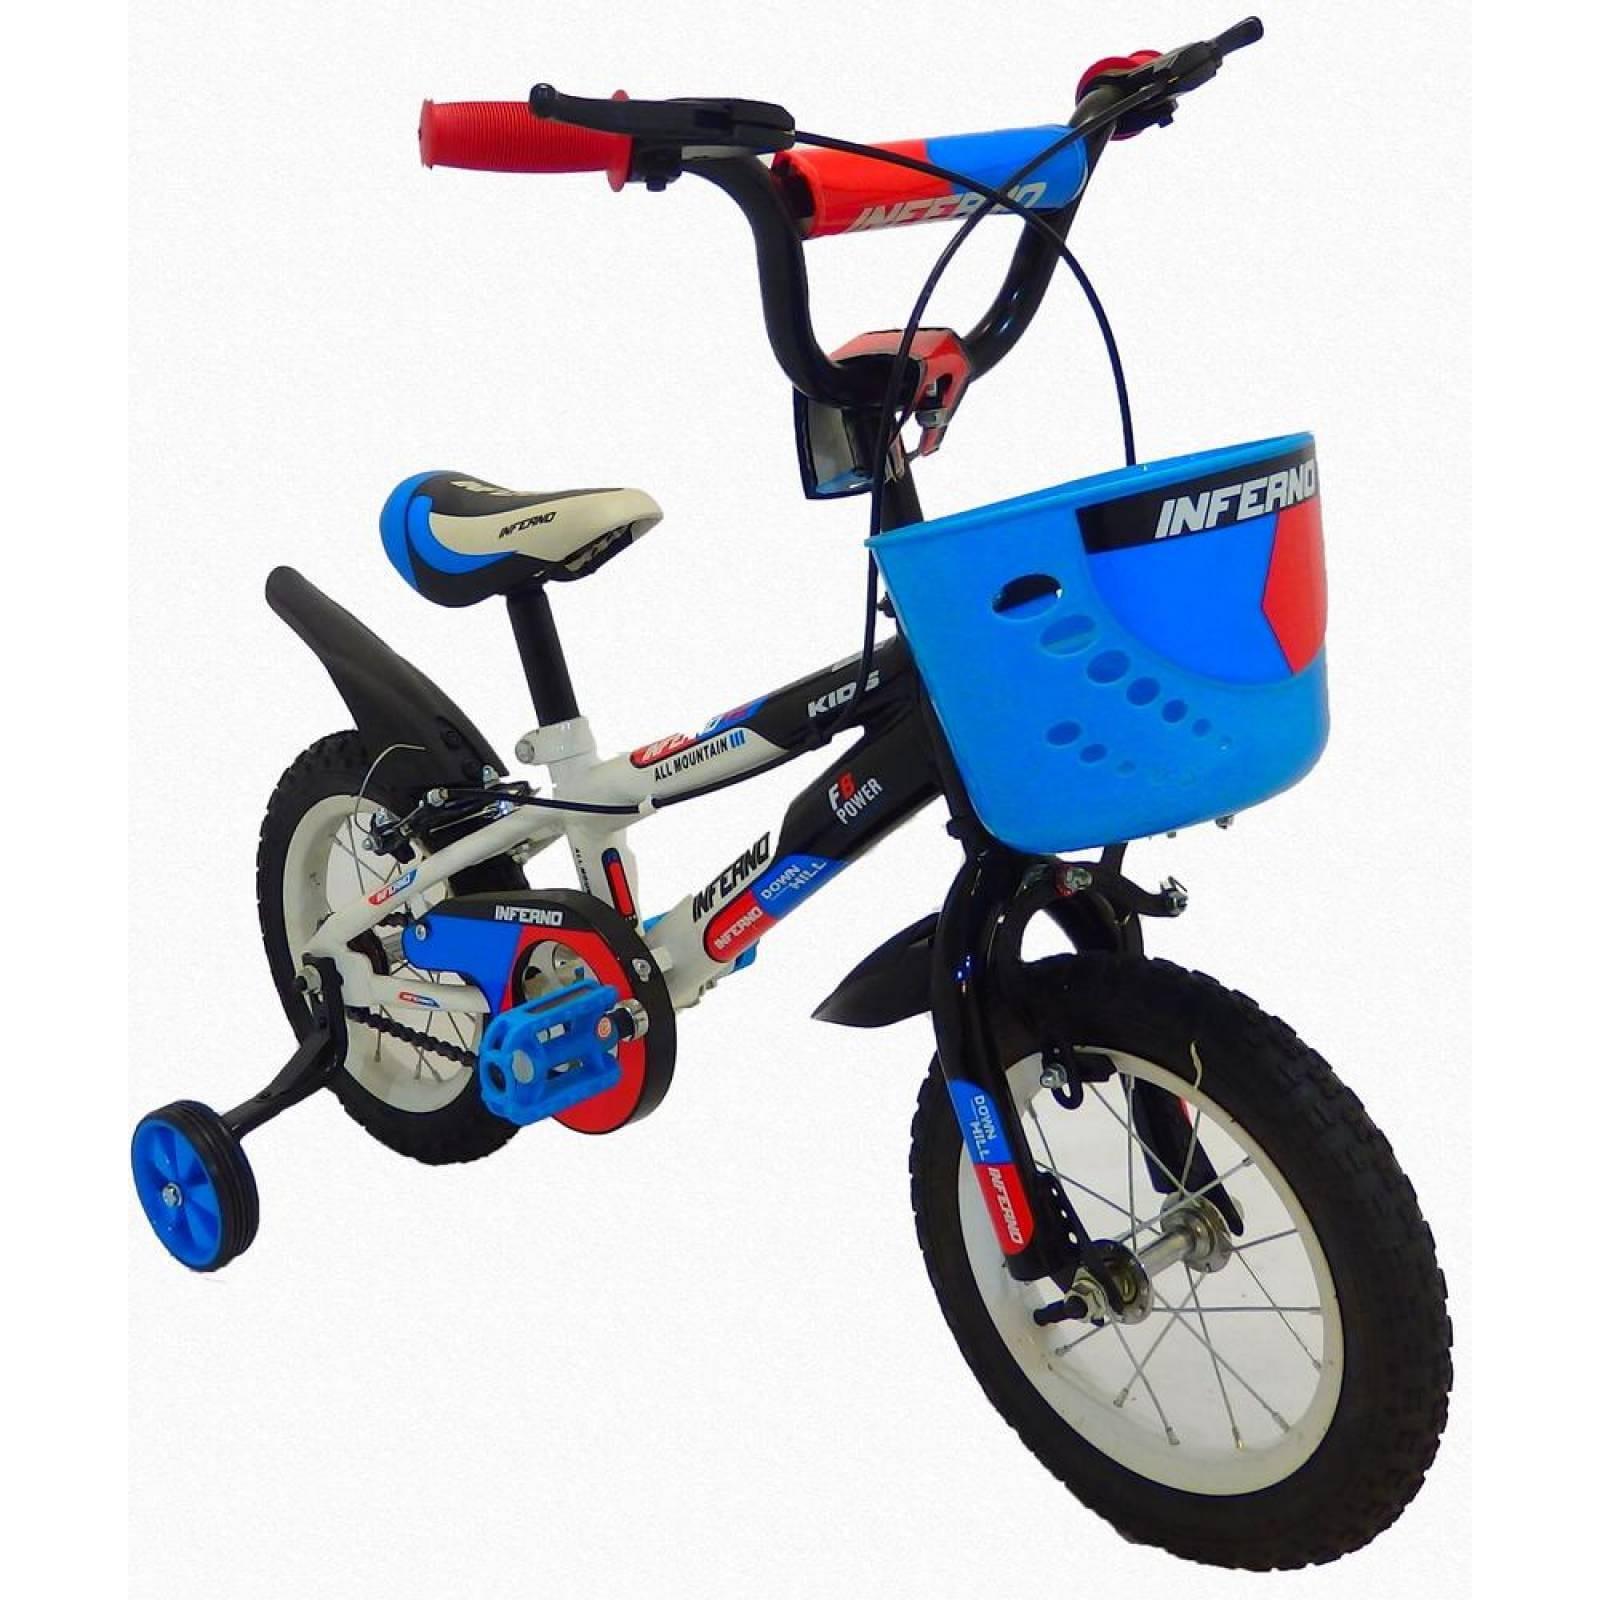 Bicicleta Infantil para niño rodada 12 Inferno Blanco